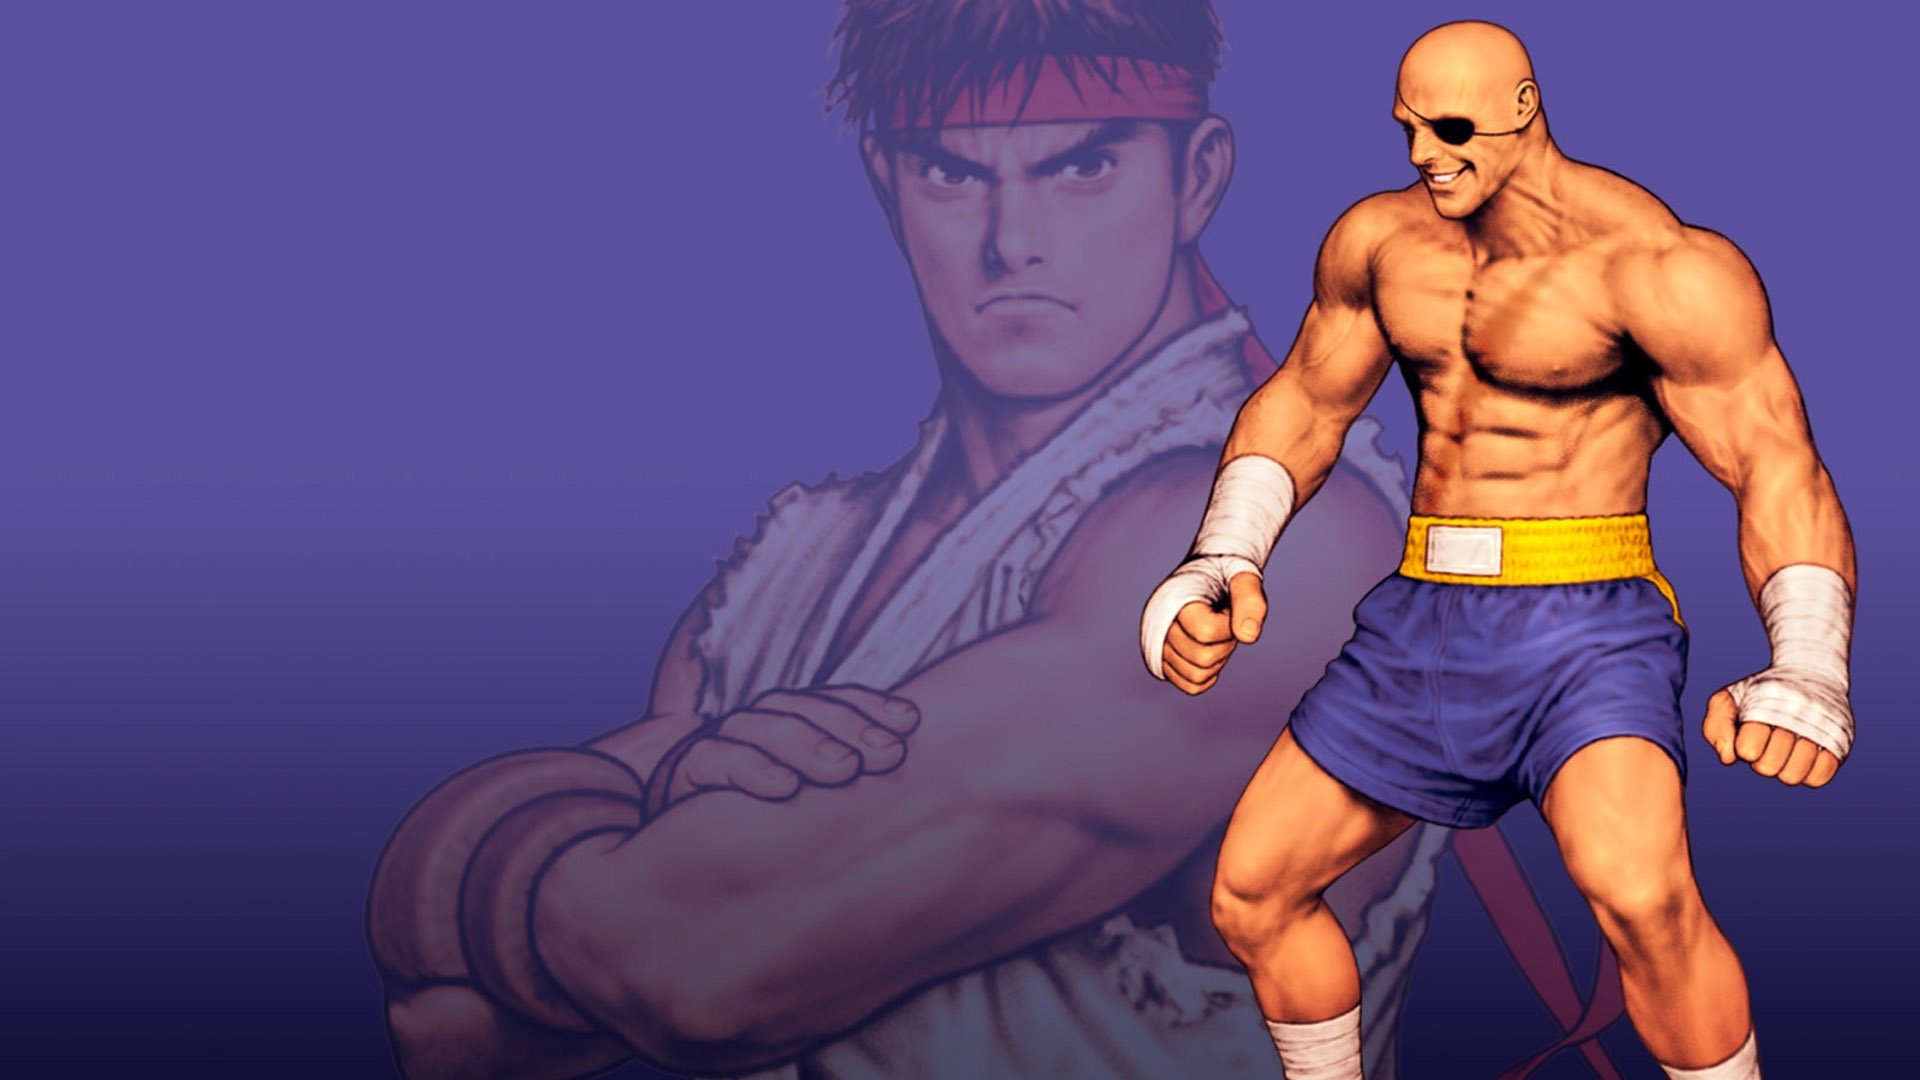 2 Capcom Vs Snk 2 Eo Hd Wallpapers Background Images